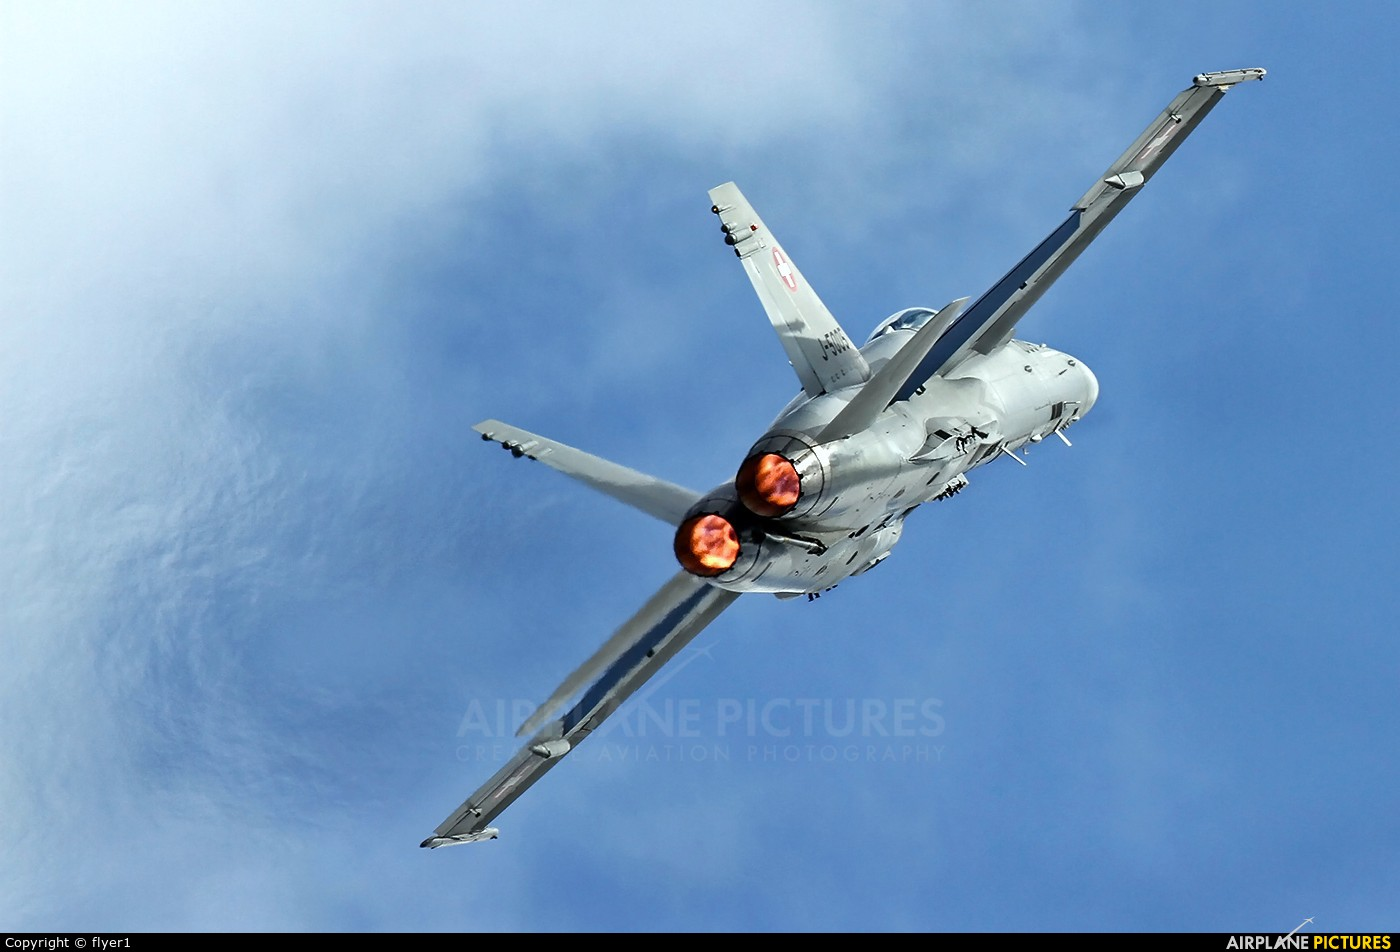 Switzerland - Air Force J-5005 aircraft at Waddington